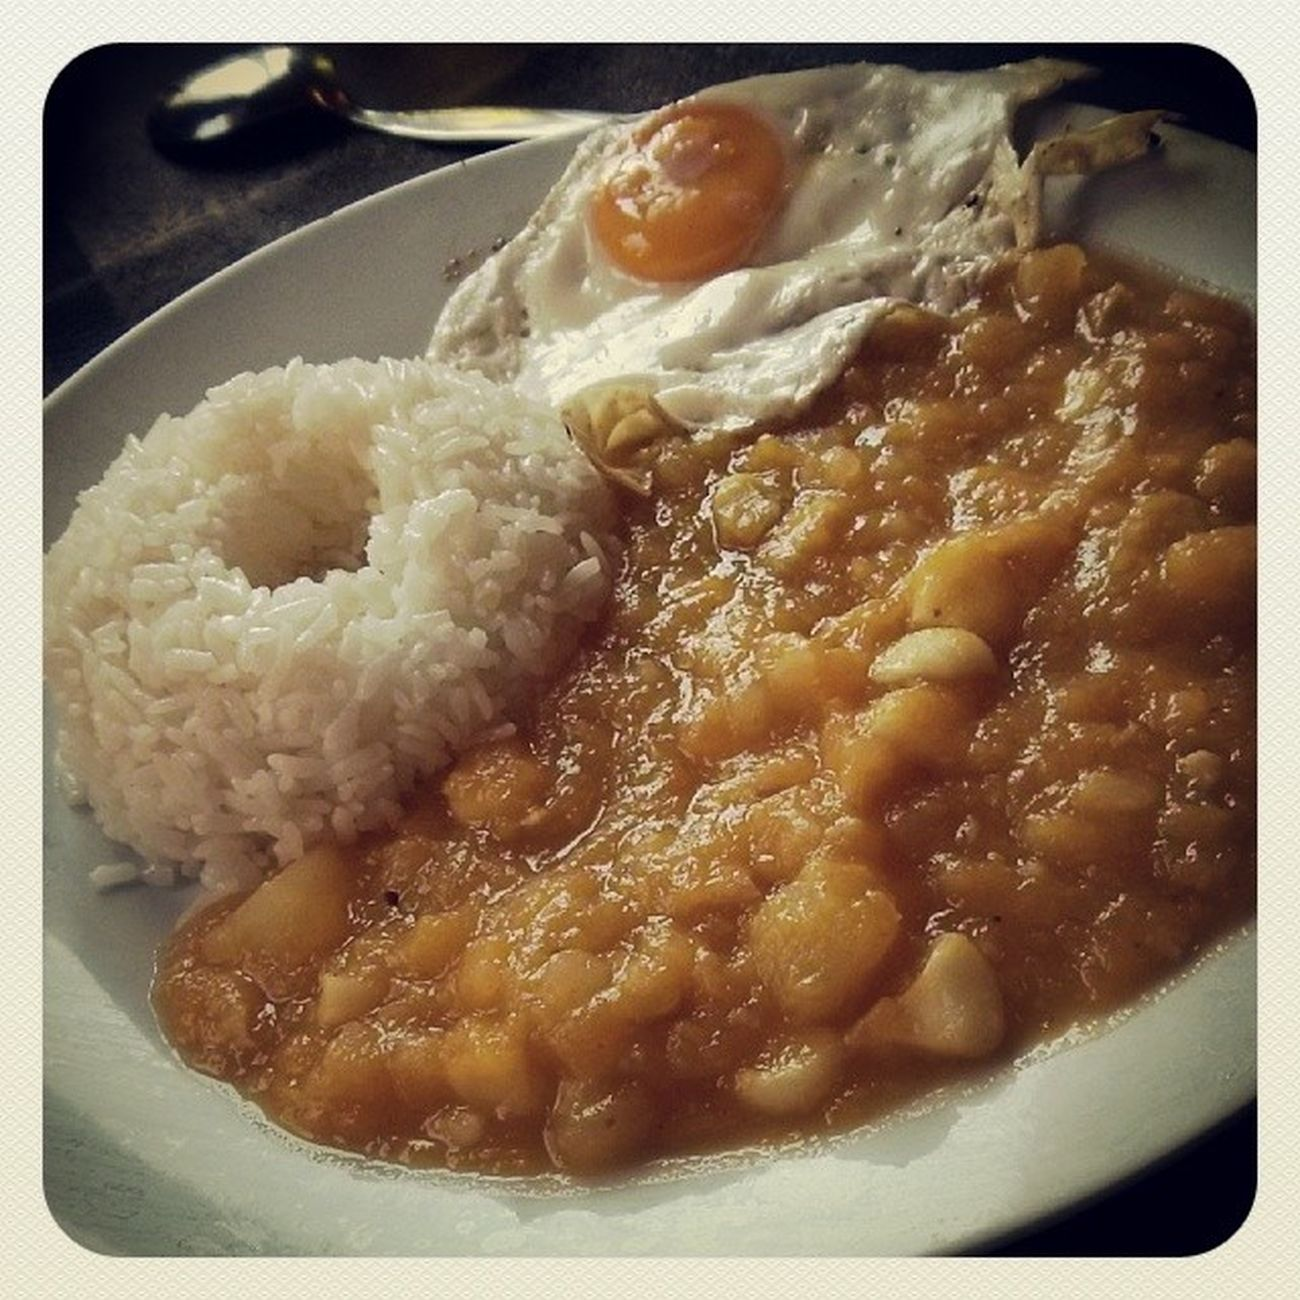 Foodporn Peruvianfood PeruvianCuisine Locro LunchTime Lunch w/@caritodegregori